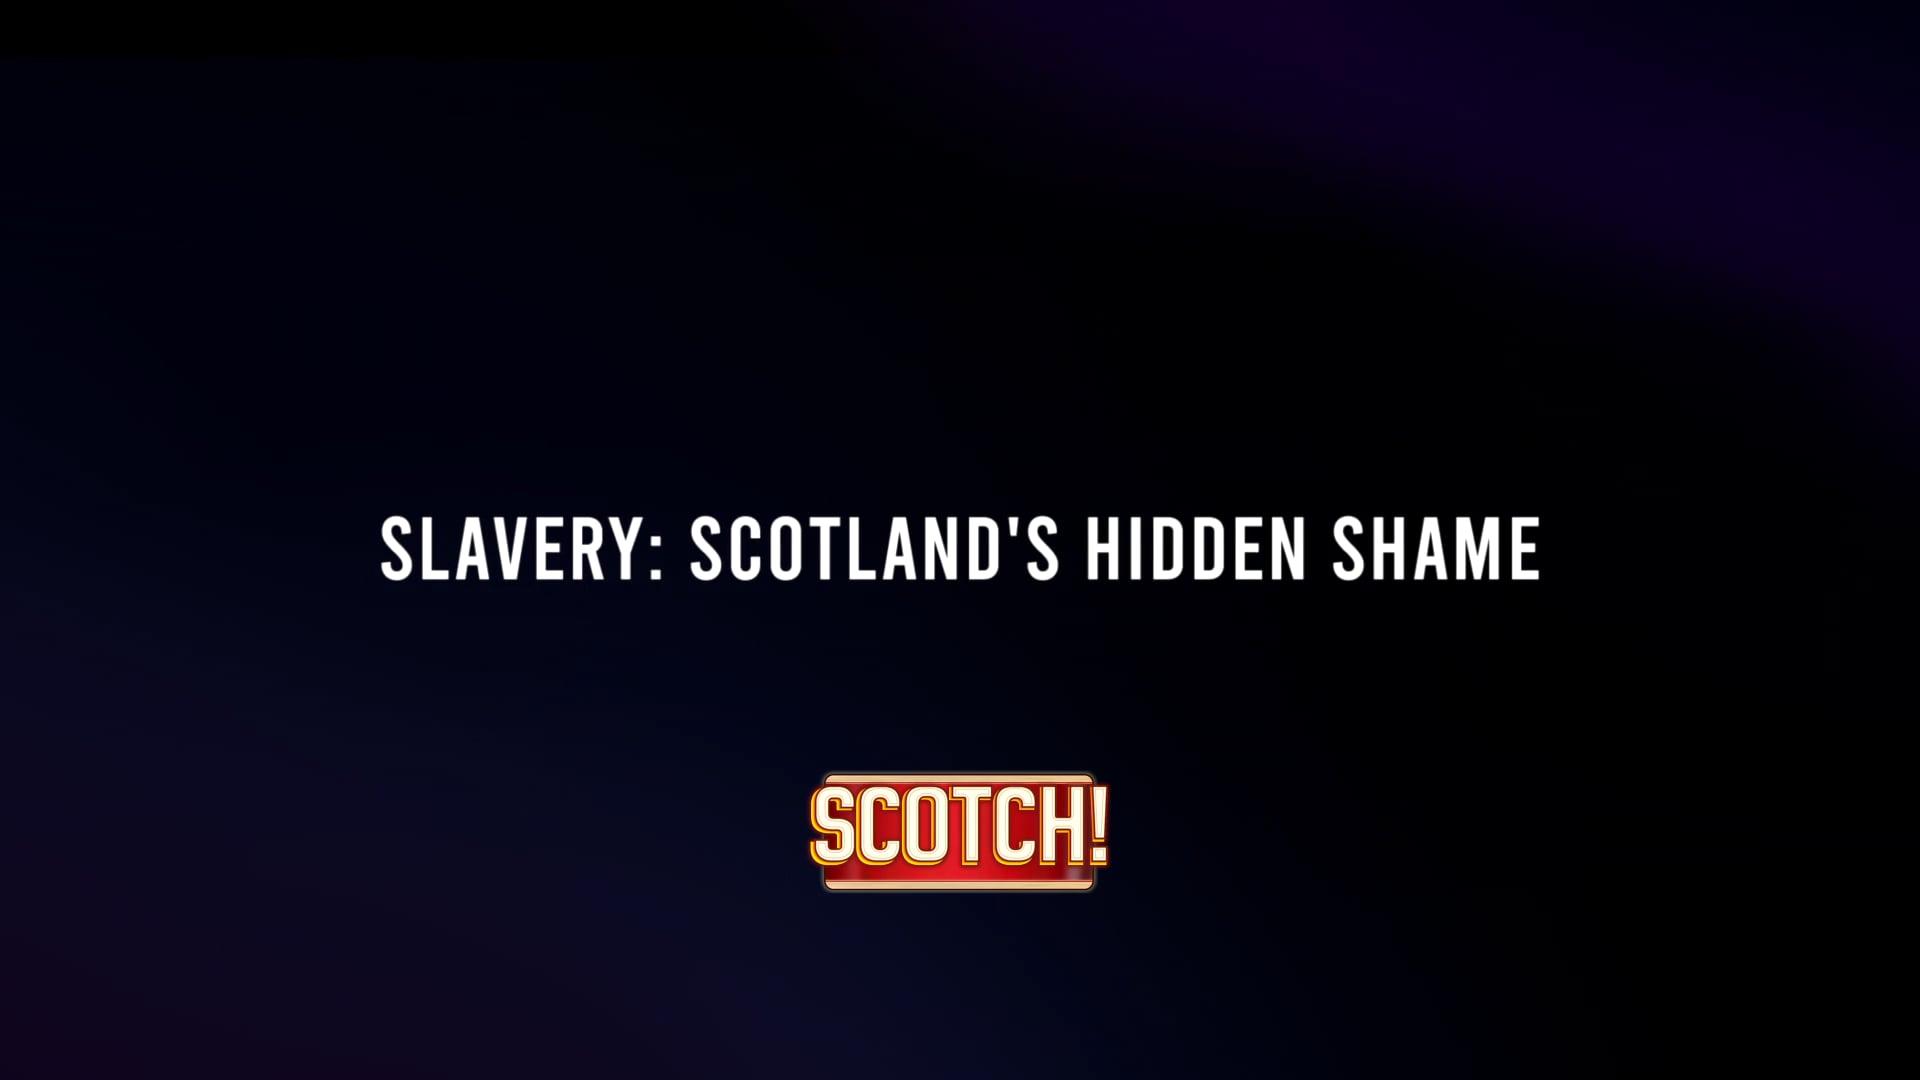 Slavery: Scotland's Hidden Shame